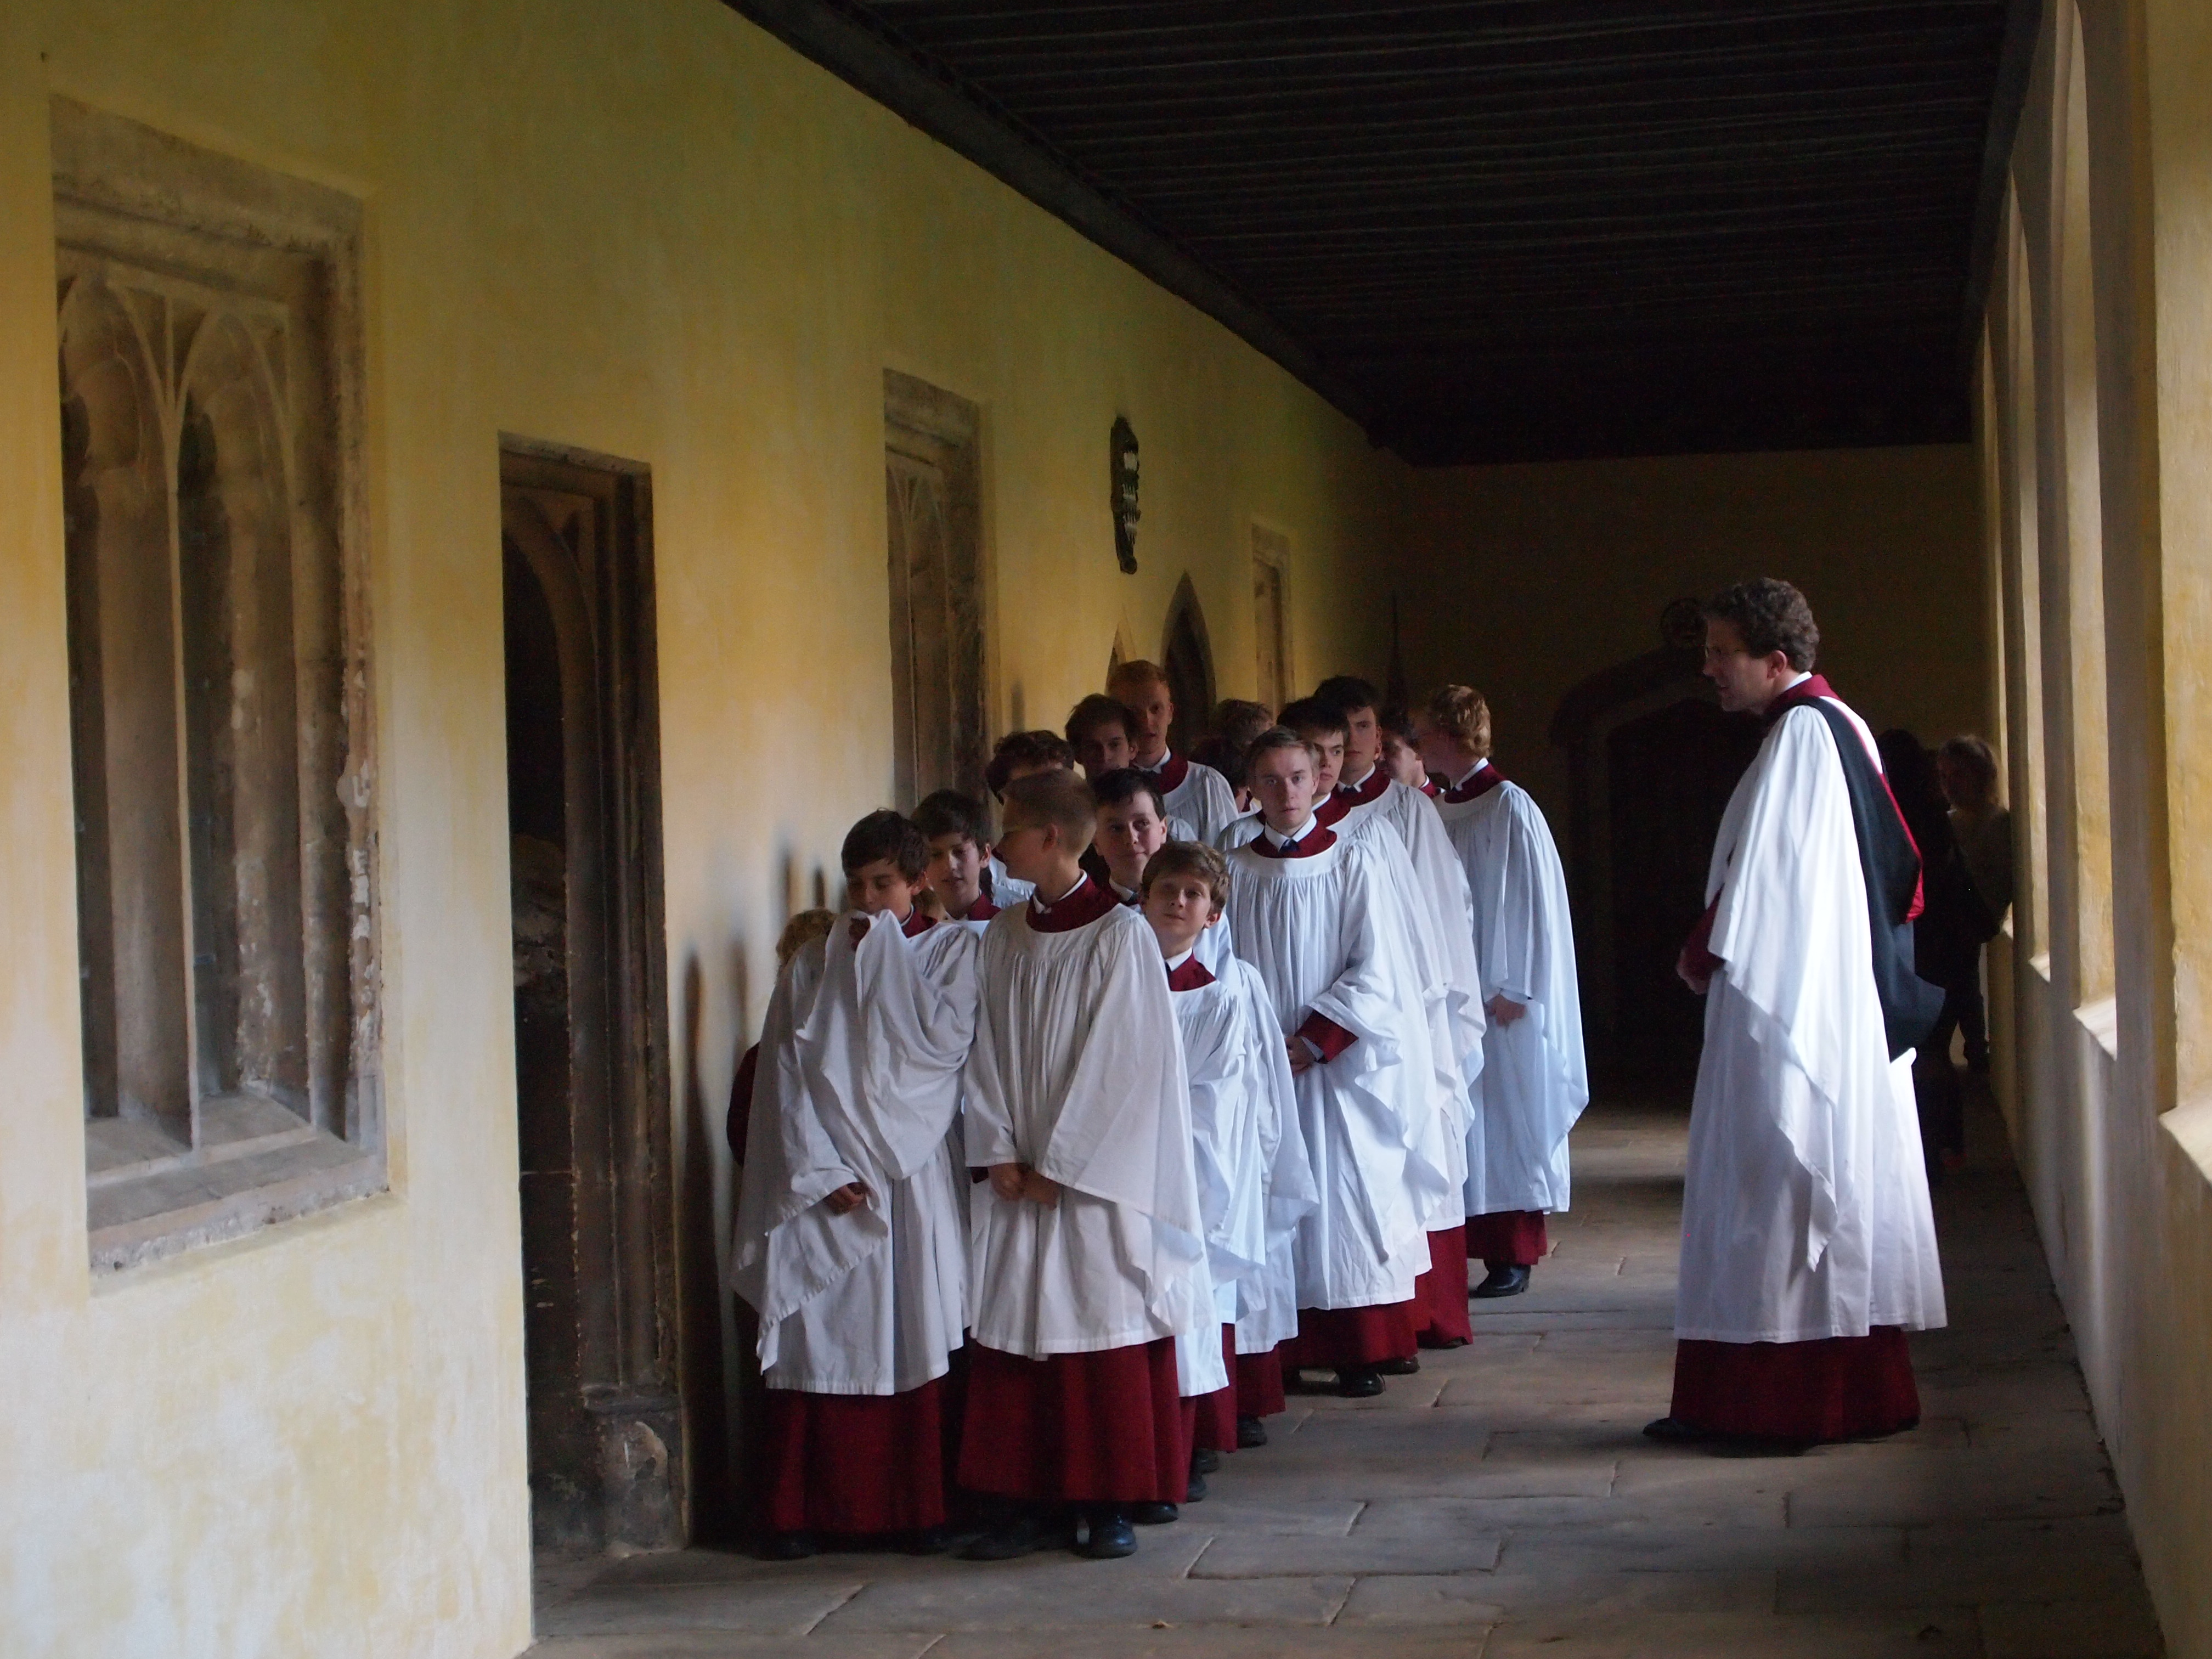 Magdalen Choir in the Cloisters